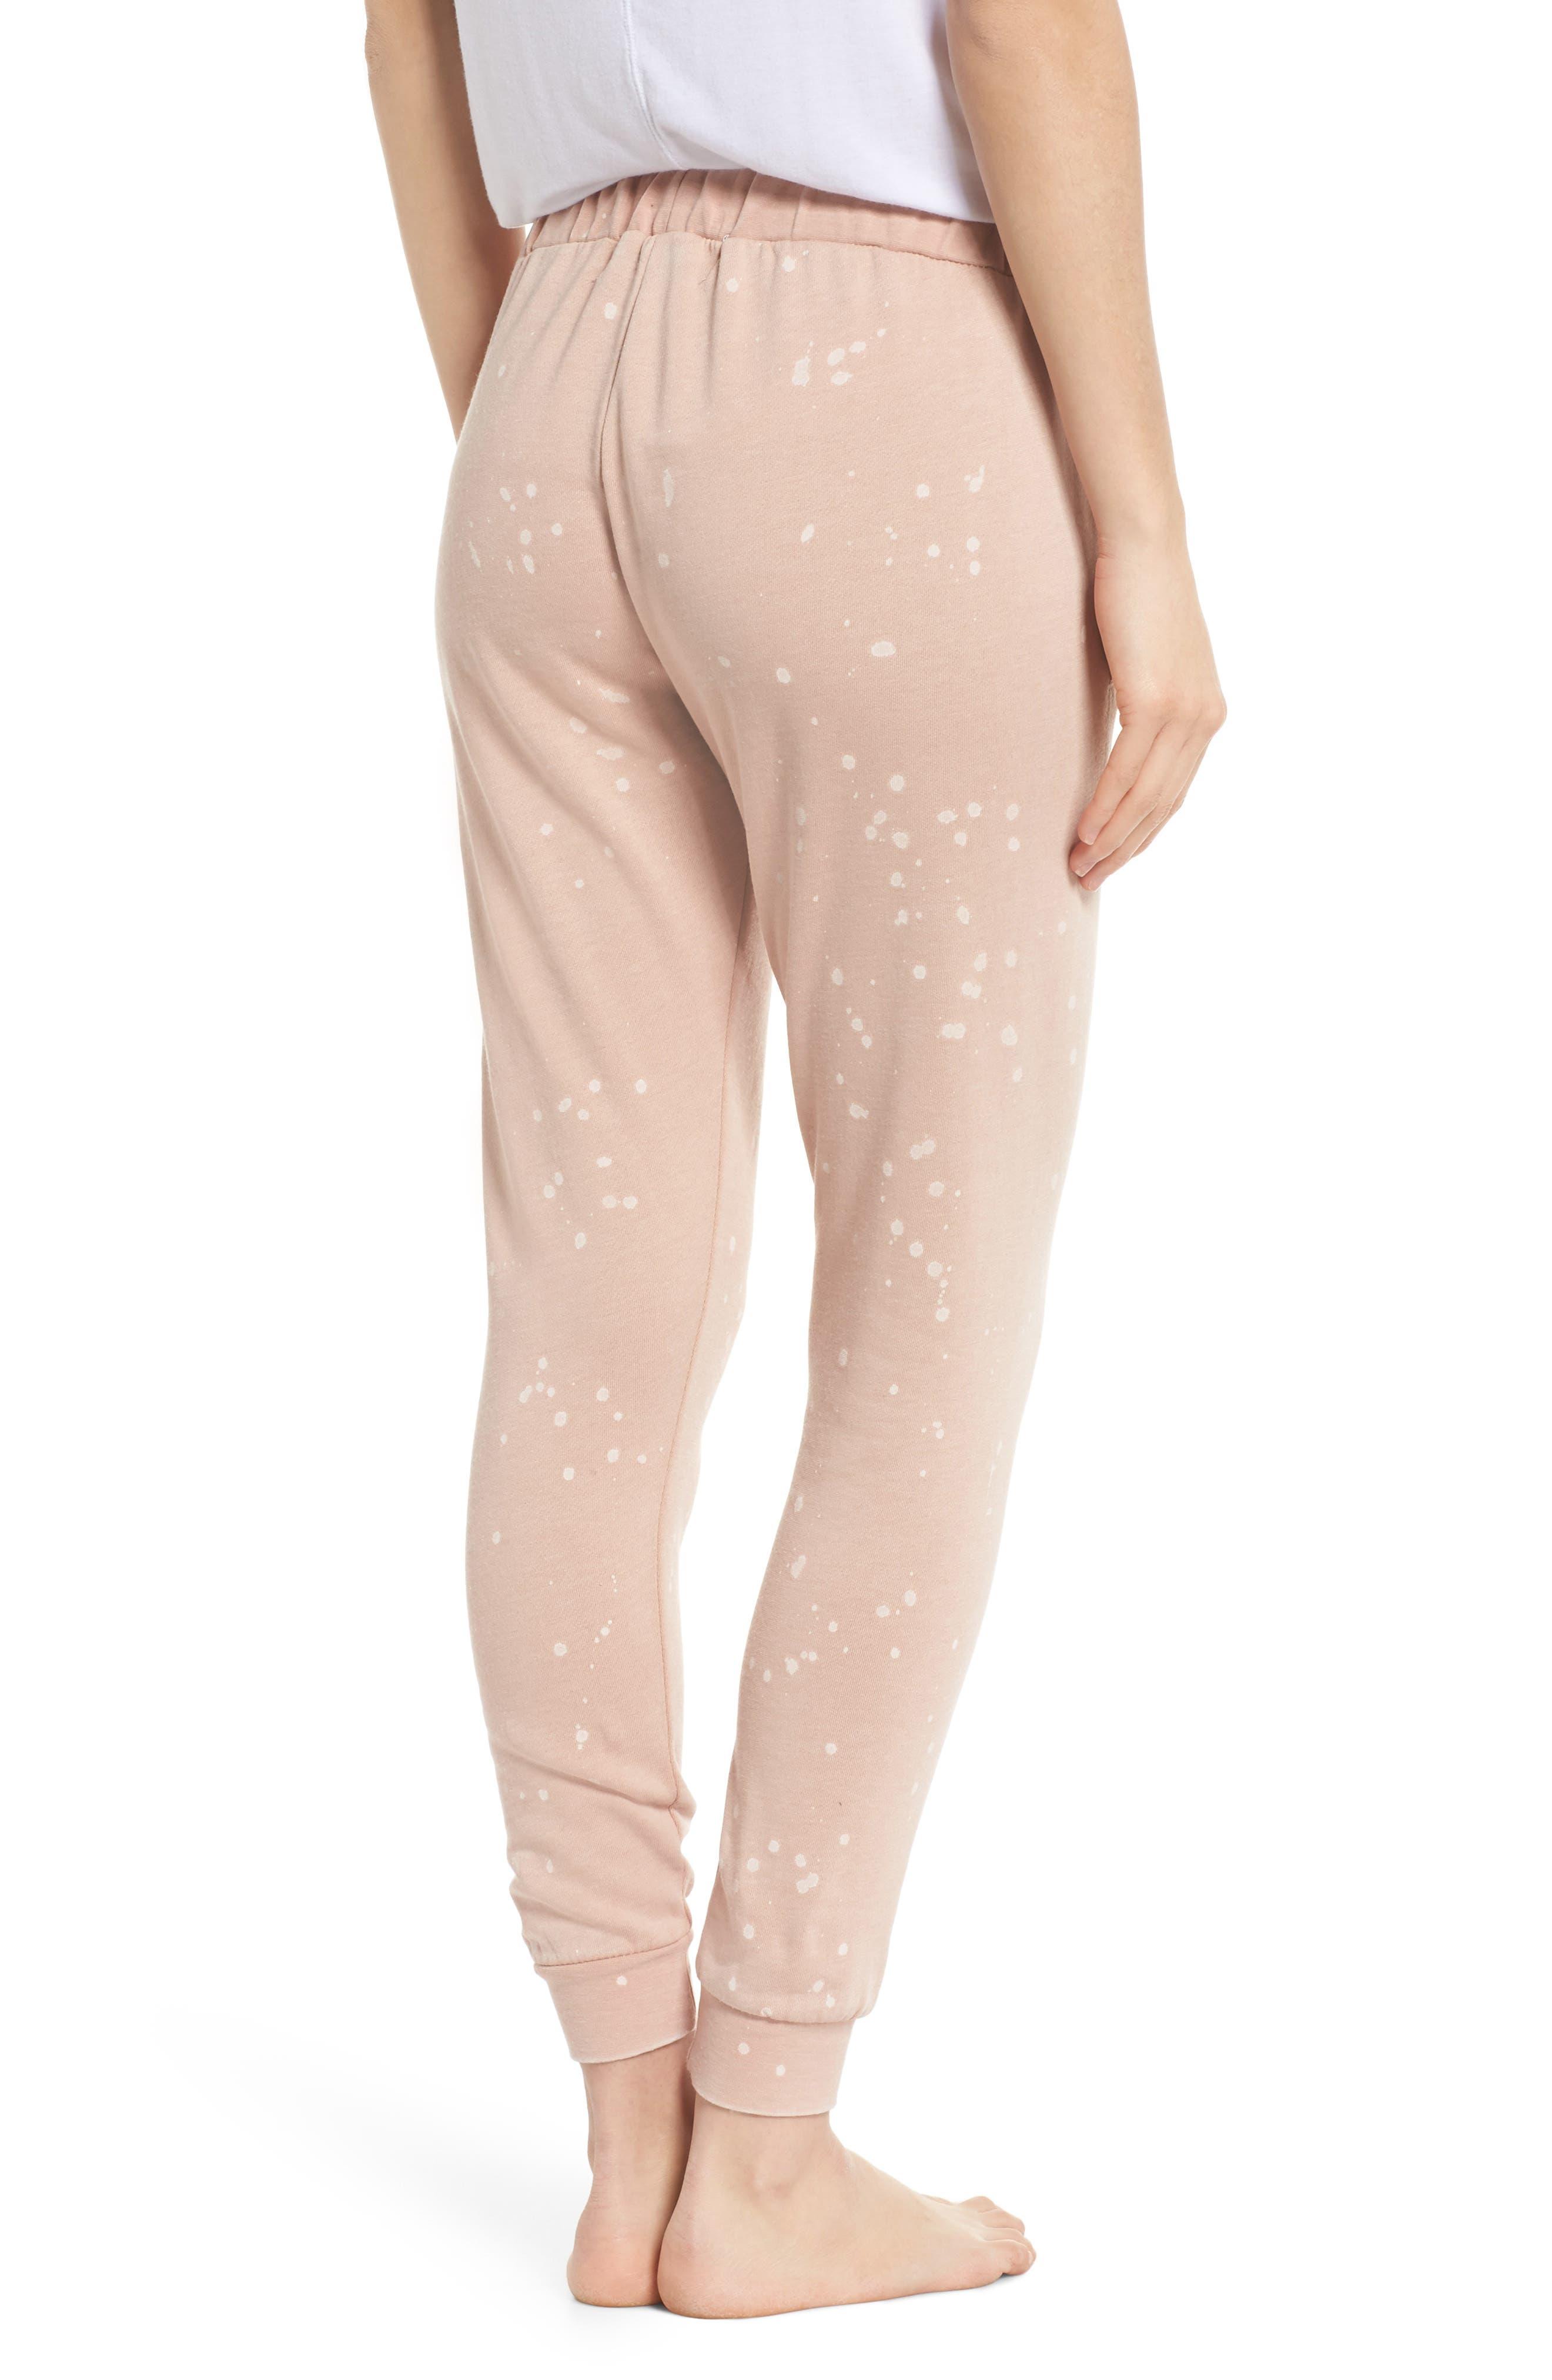 Lounge Pants,                             Alternate thumbnail 2, color,                             Shroom Speckle